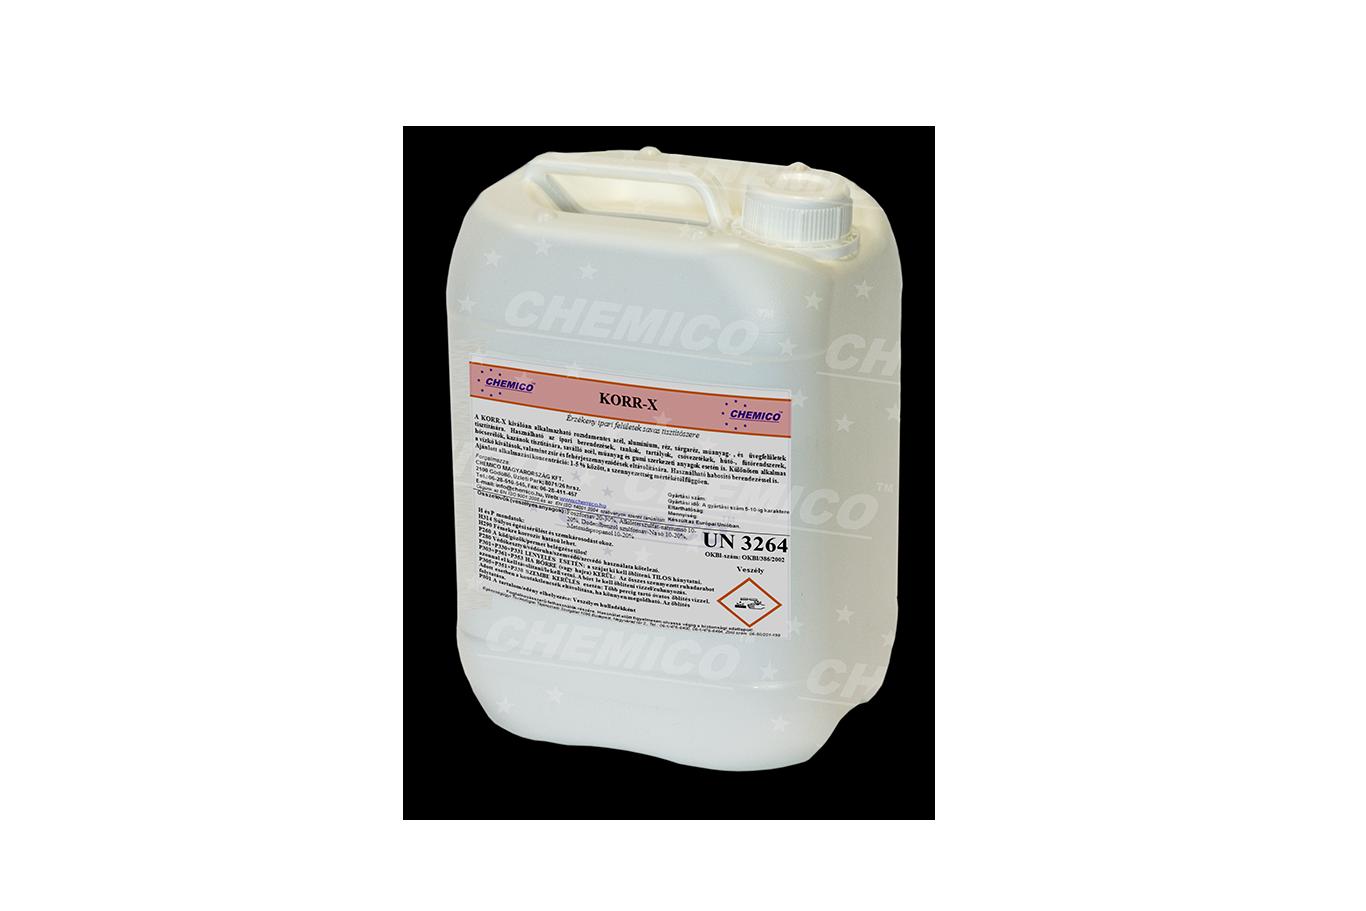 korr-x-vizkooldo-rozsdamentes-savas-ipari-chemico-5l